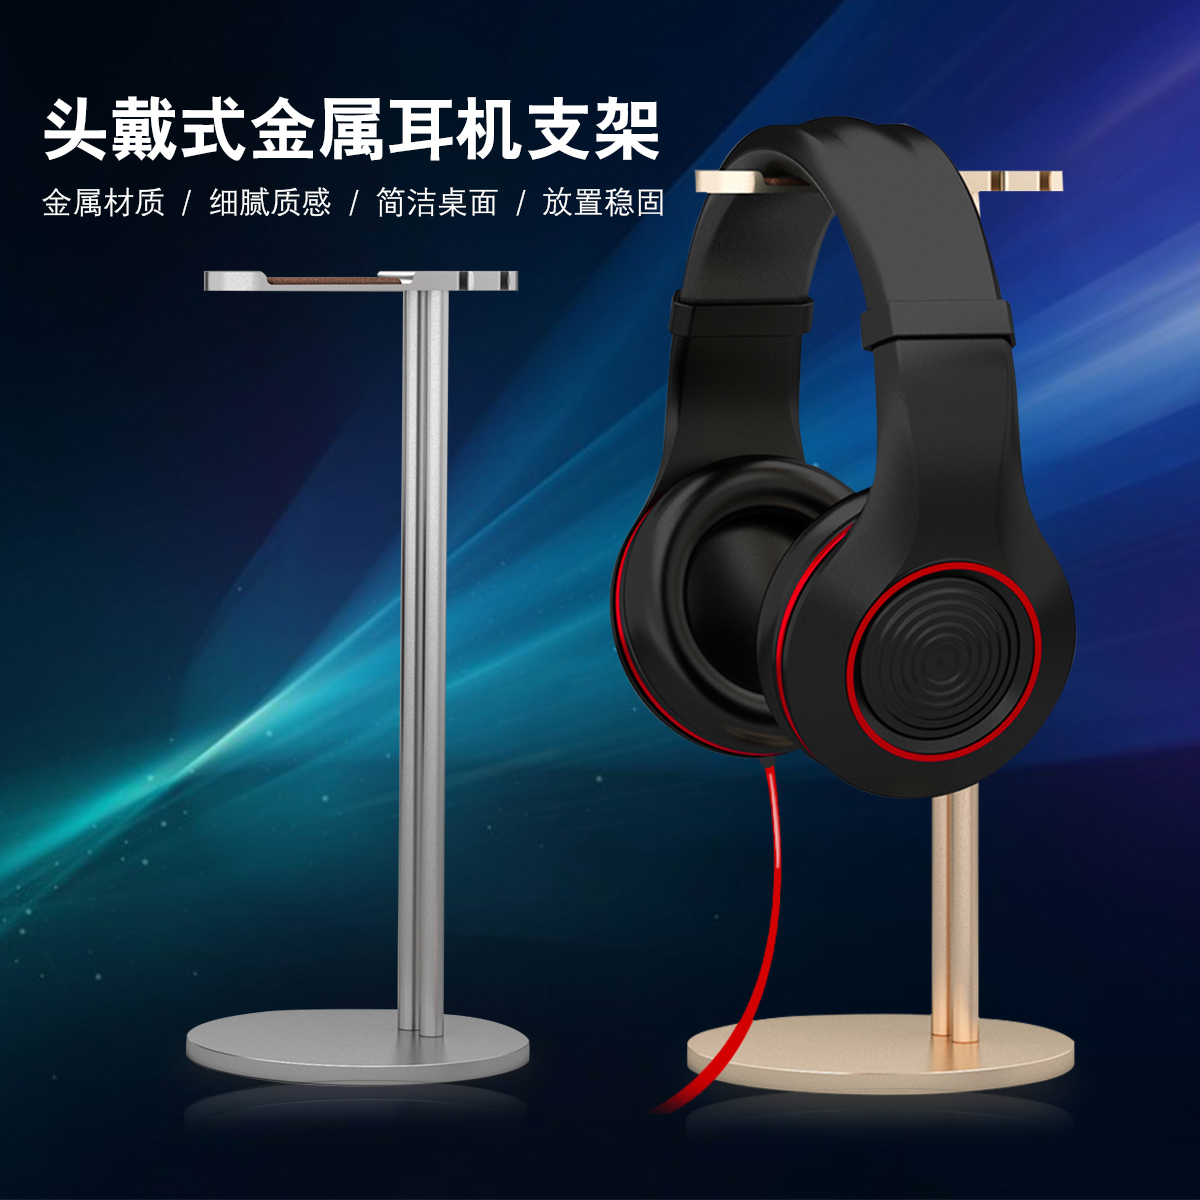 c4c7c9e4641 Get Quotations · New fashion headset gaming headset earphone headset stand  rack shelf bracket metal influx of stereo headphones